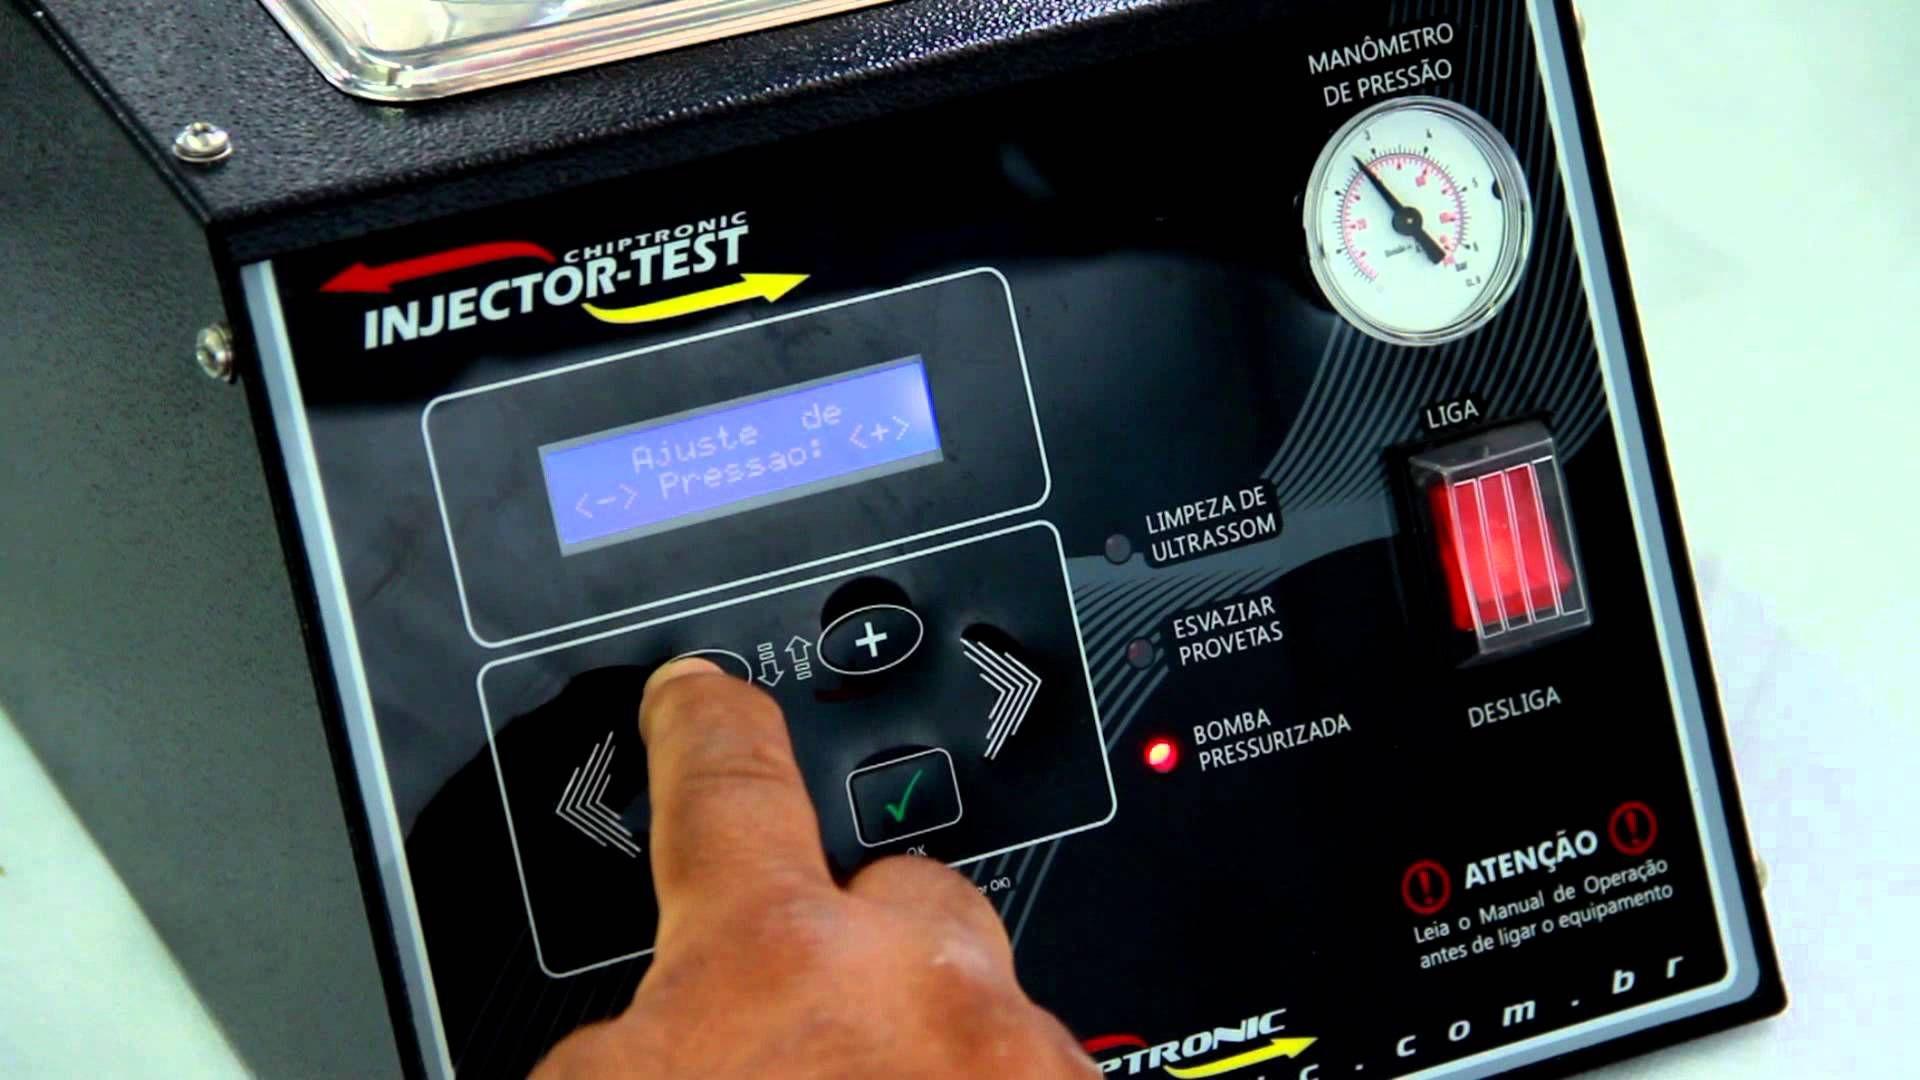 Máquina de limpeza de bicos injetores - Injector-test